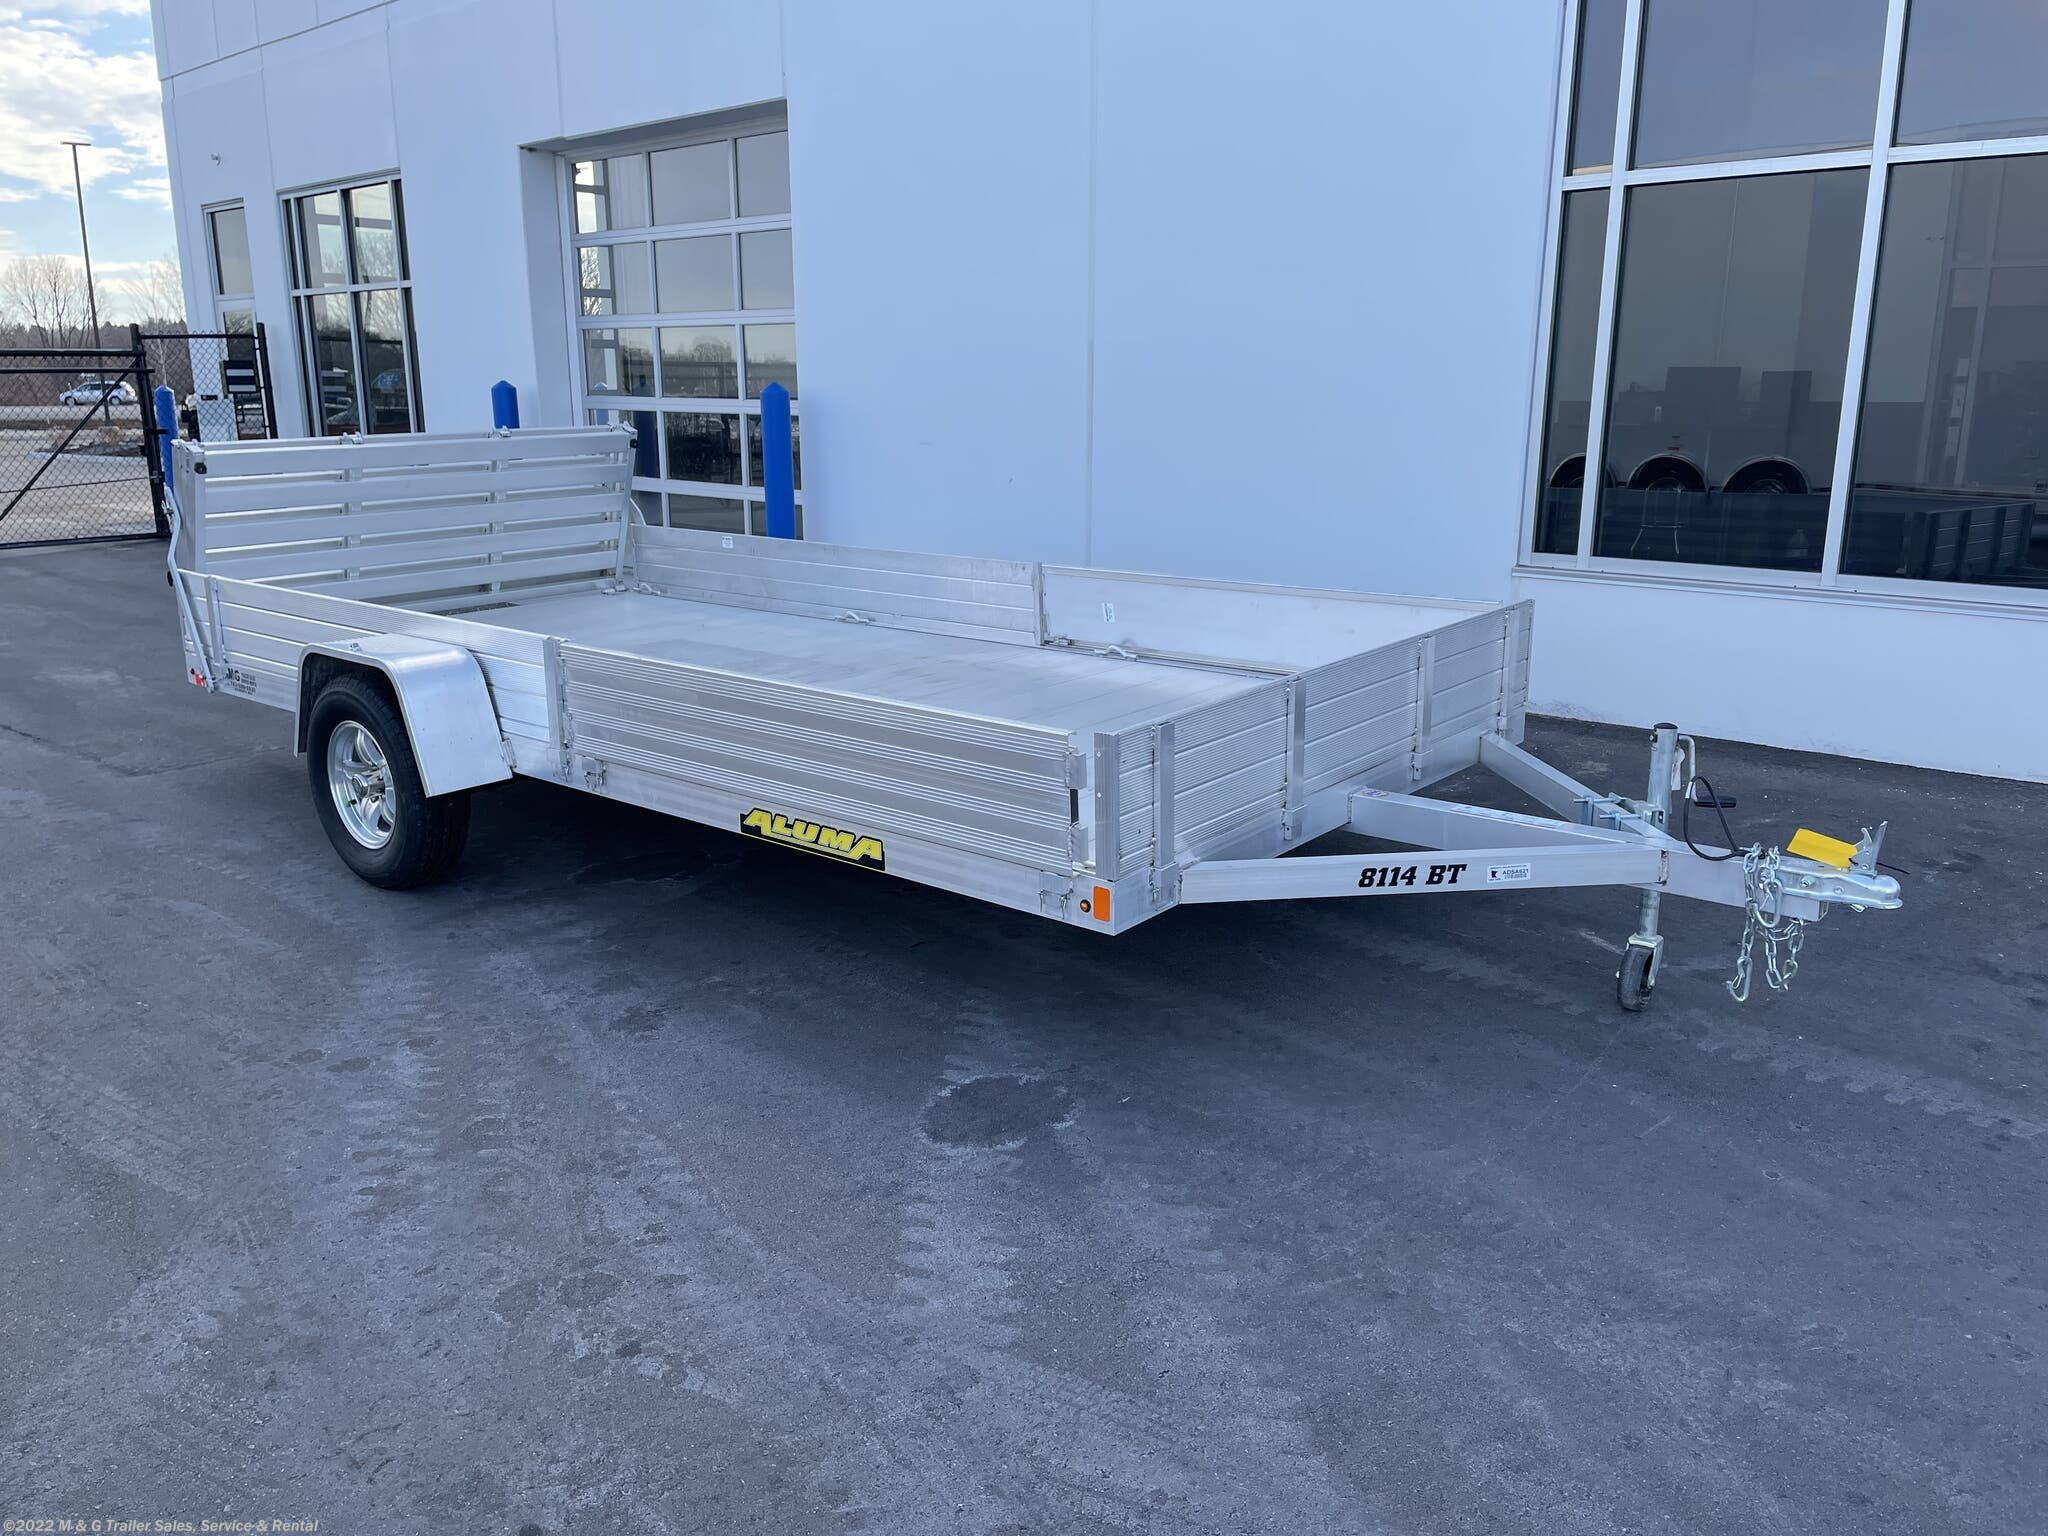 2021 Aluma 8114 BT-SR Aluminum Frame ATV/Utility Trailer - Stock #223688